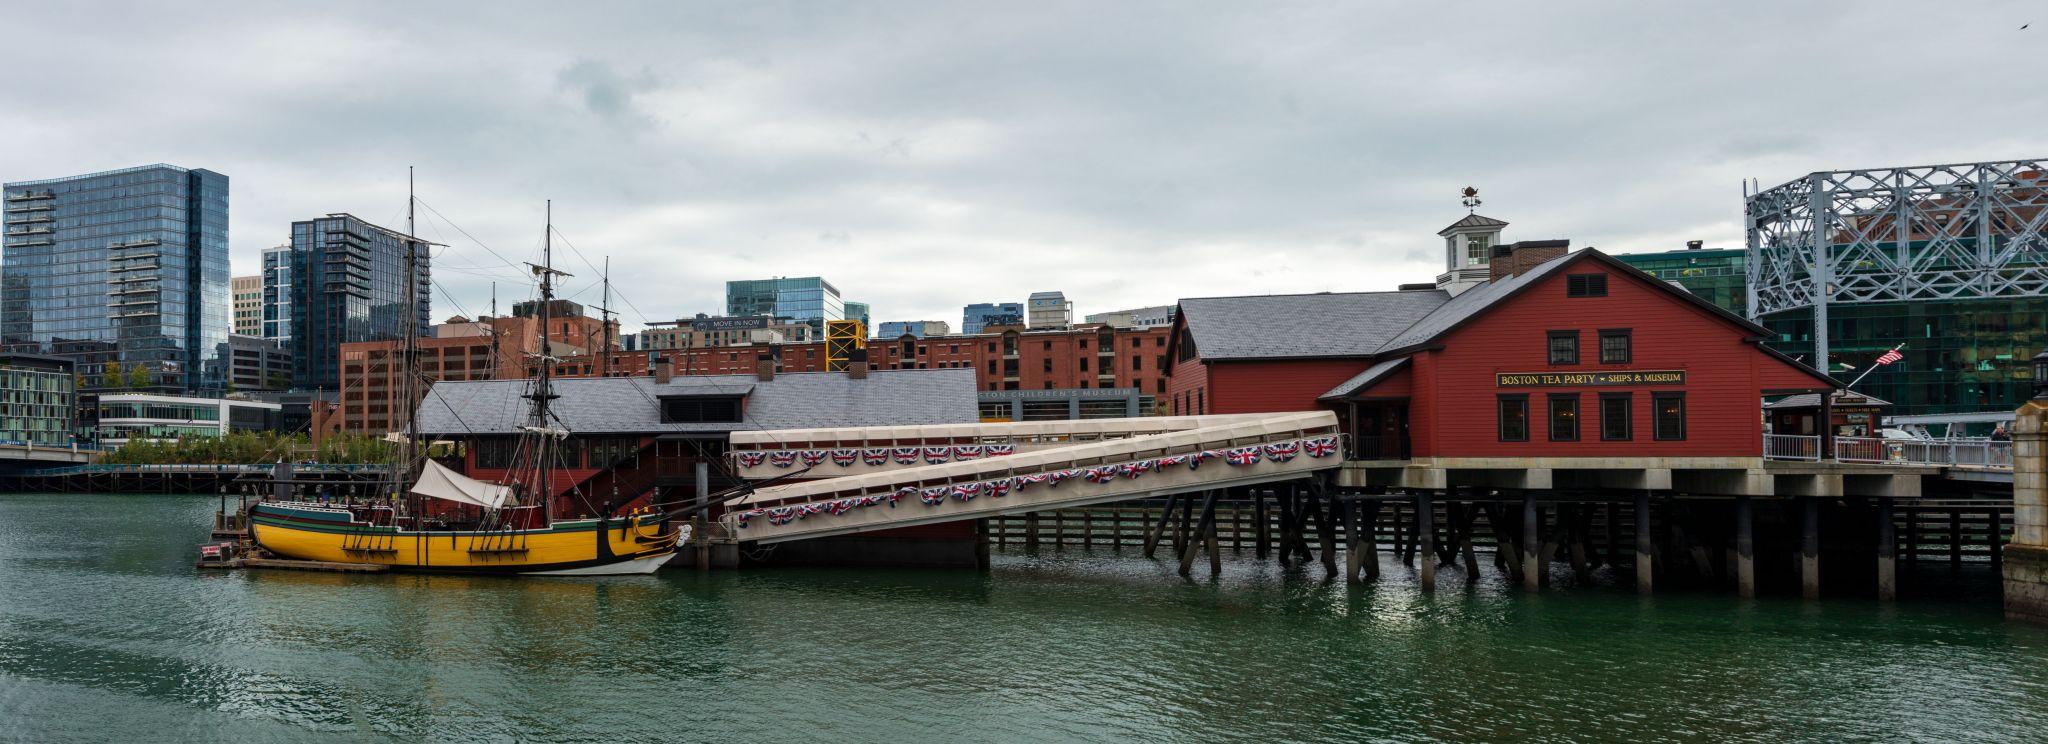 Boston Tea Party Ships & Museum, USA